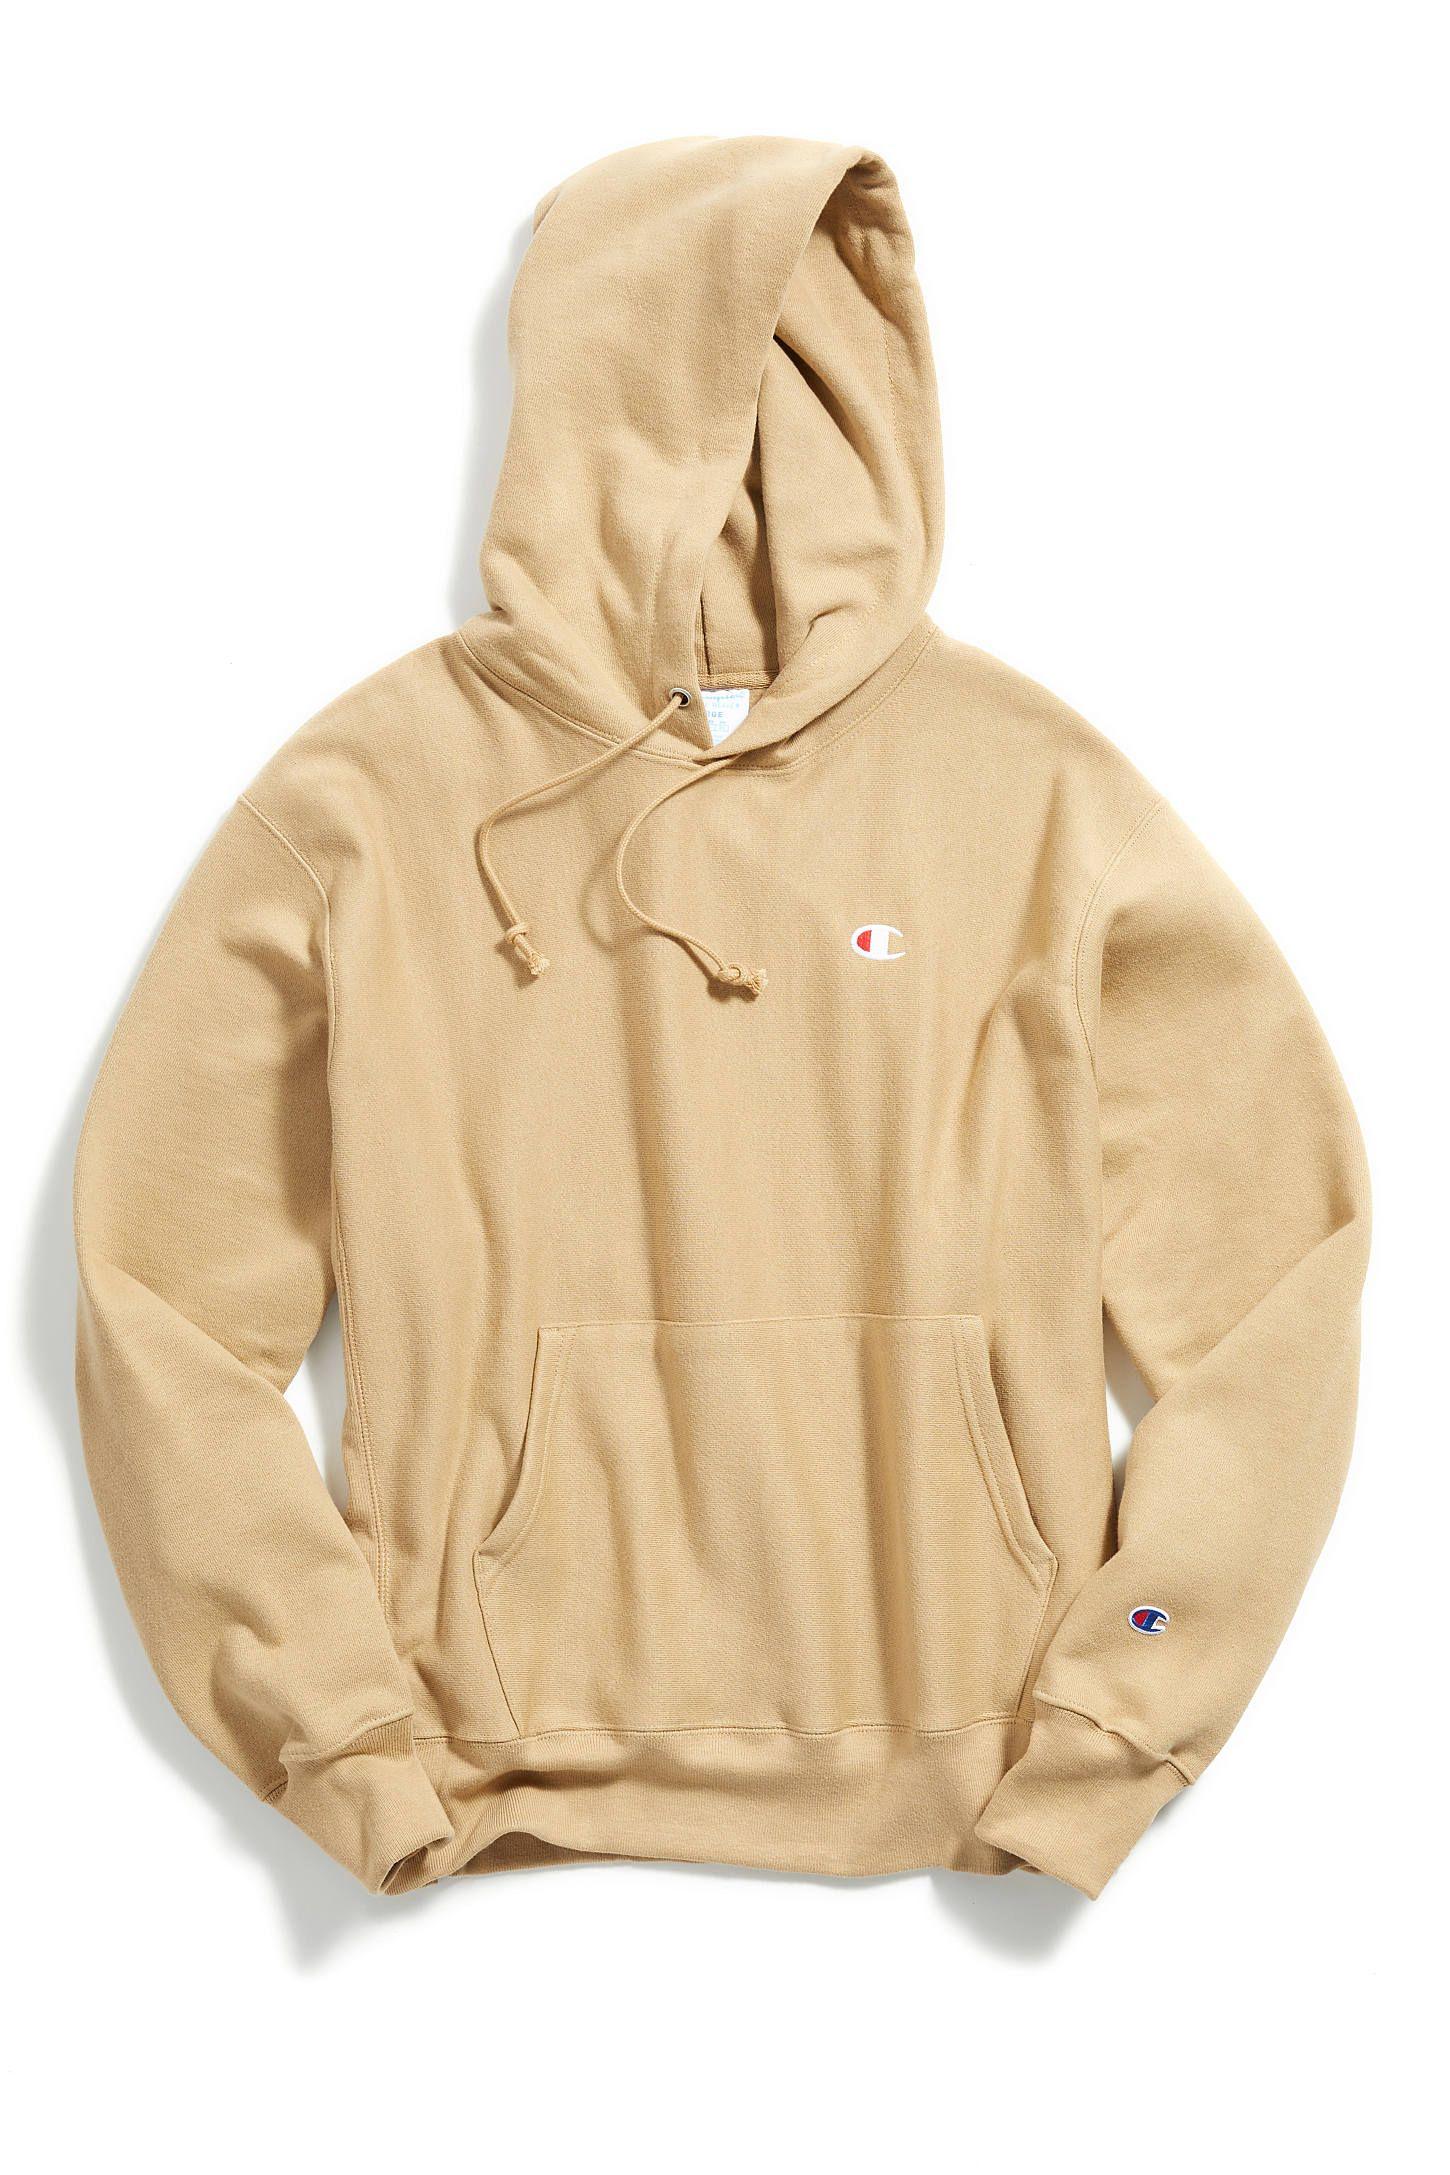 8260698e93c Champion Reverse Weave Hoodie Sweatshirt in 2018